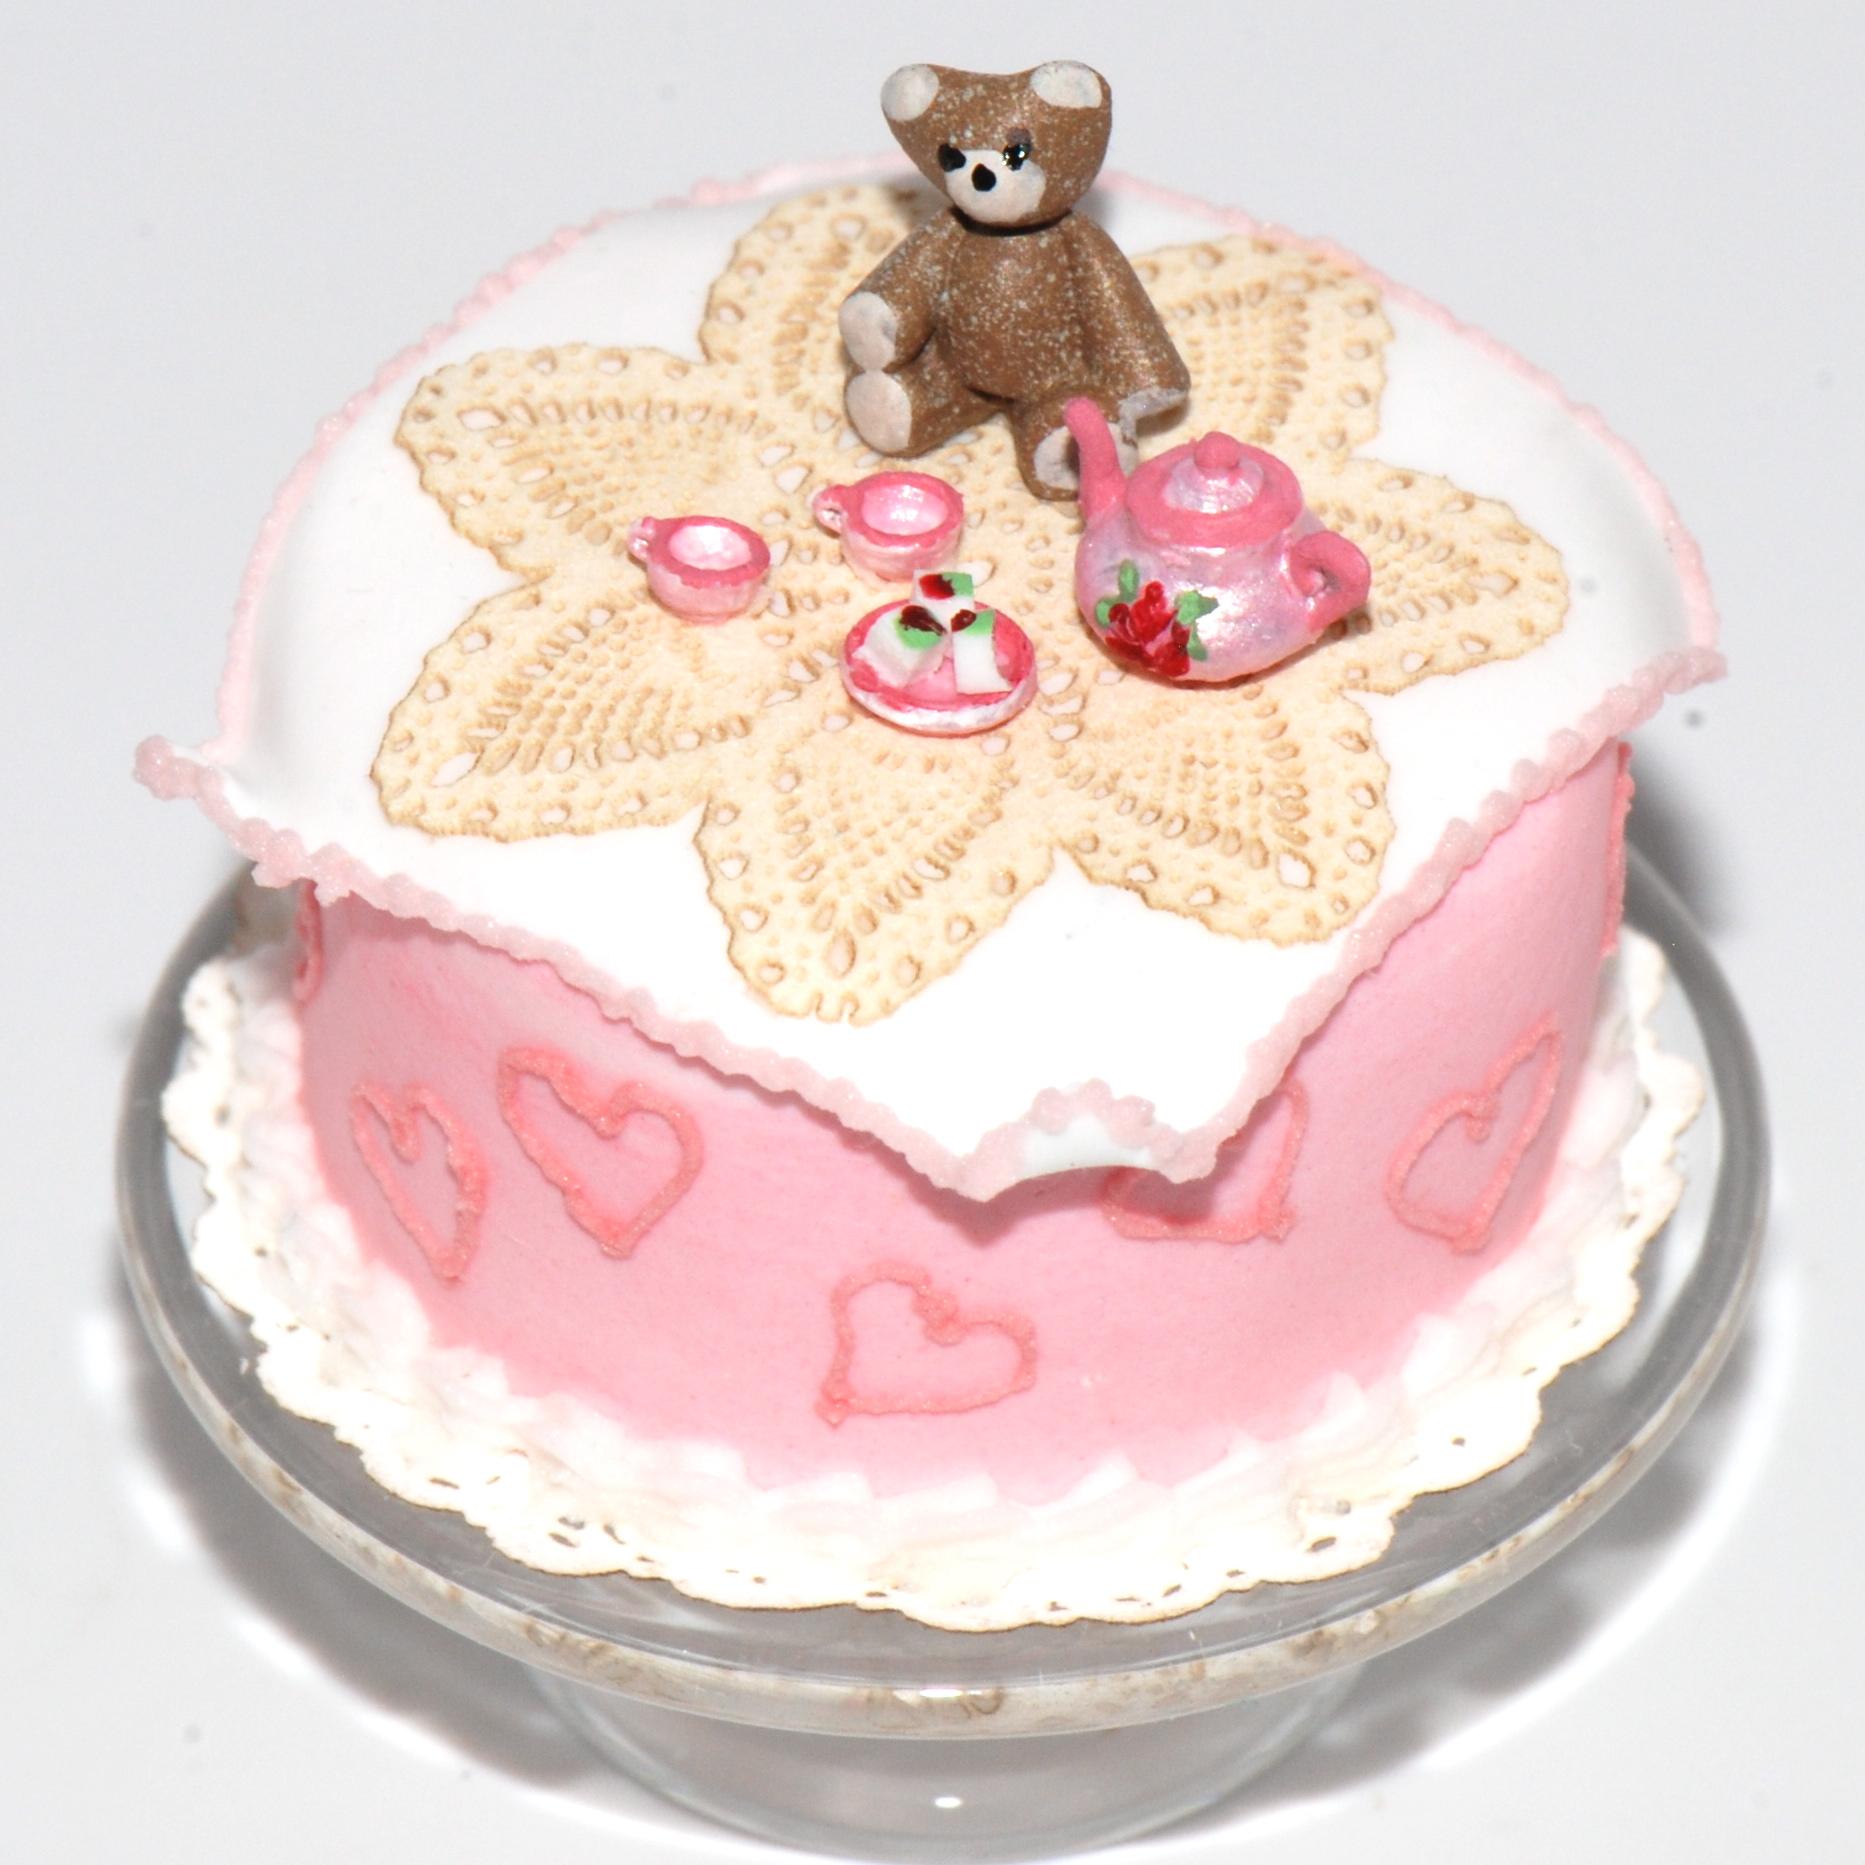 Teddy Bear Picnic Cake W Tea Set Stewart Dollhouse